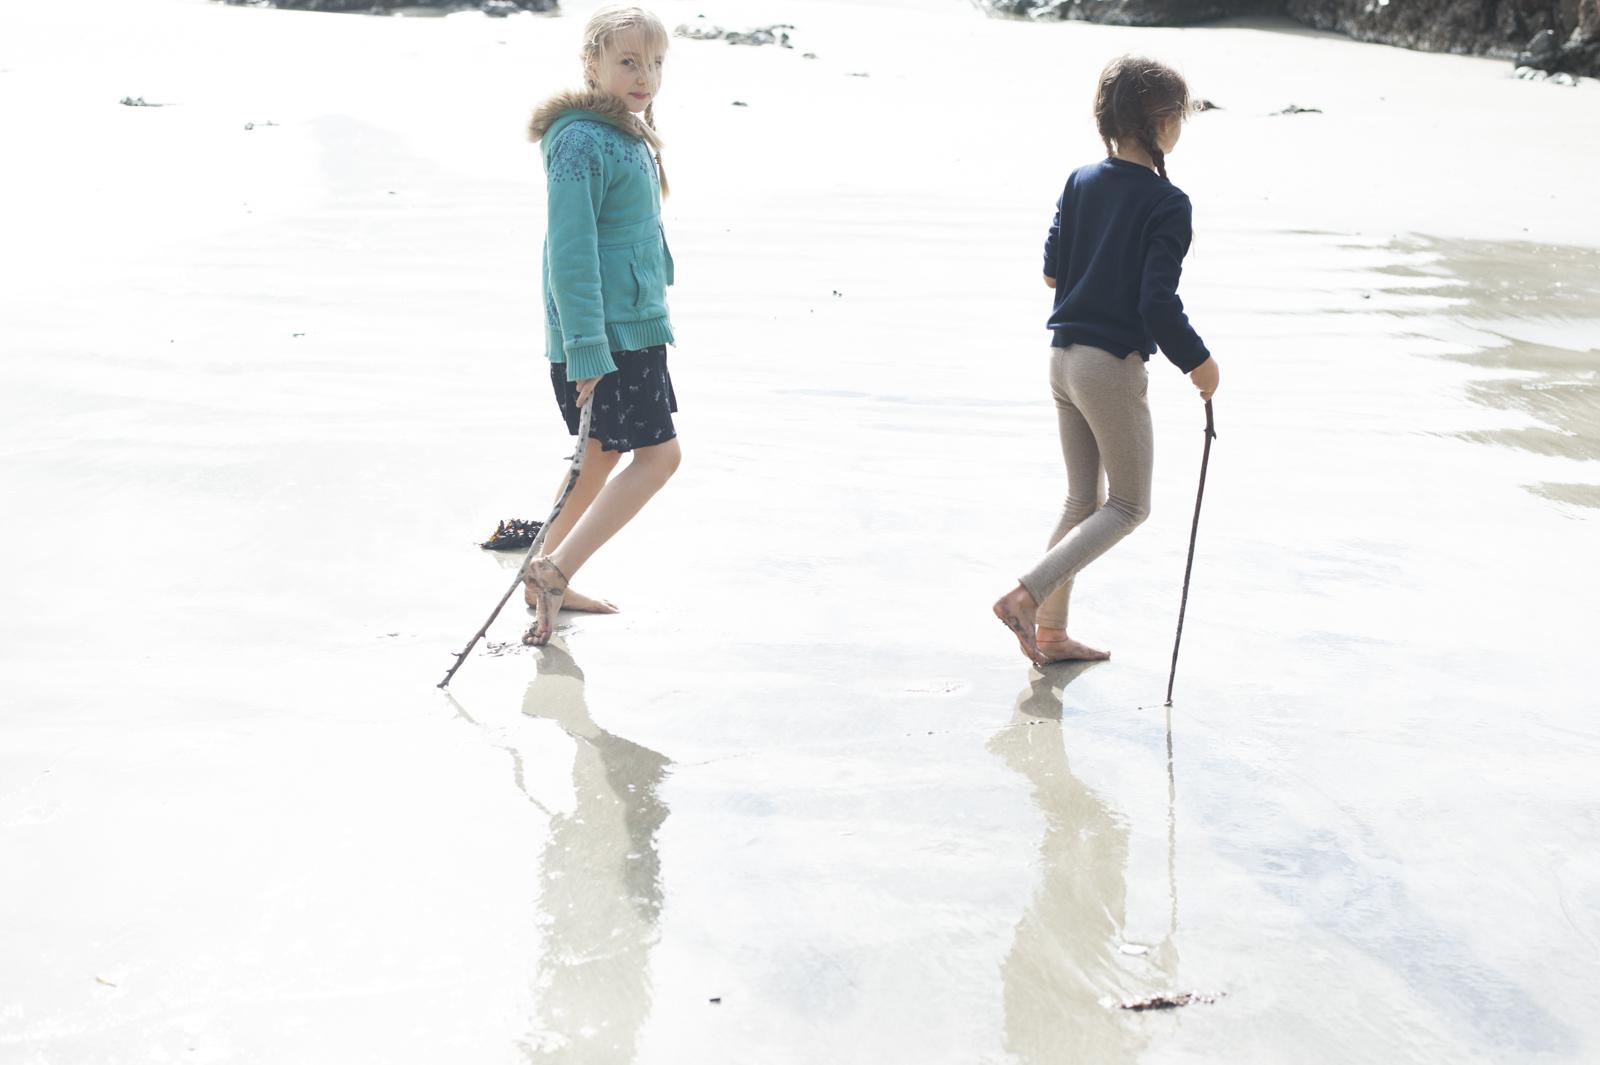 Silky soft sand underfoot